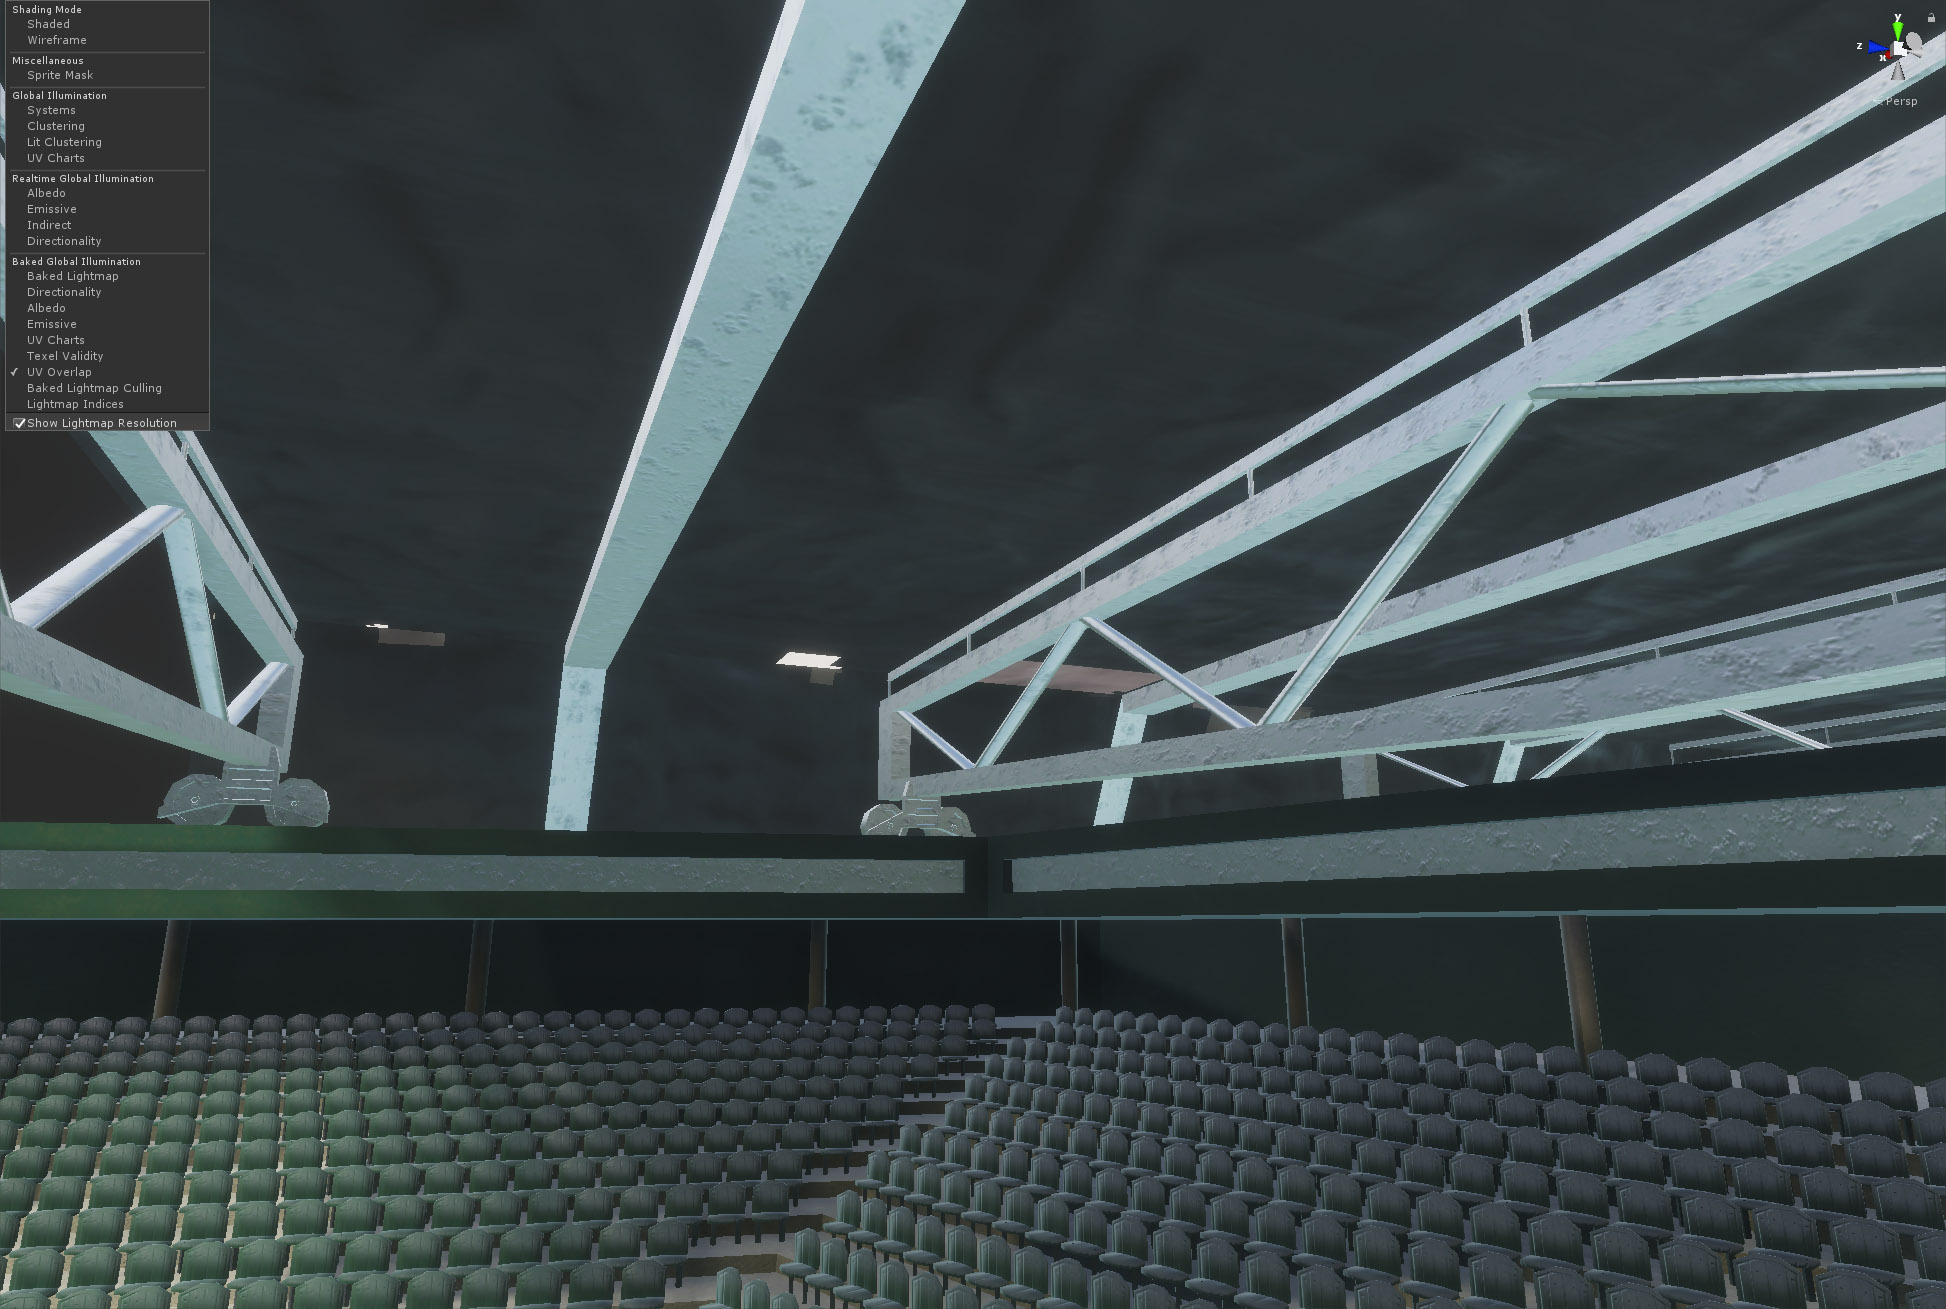 2019-08 - TE4 Stadium - Progressive GPU - UV Overlap.jpg